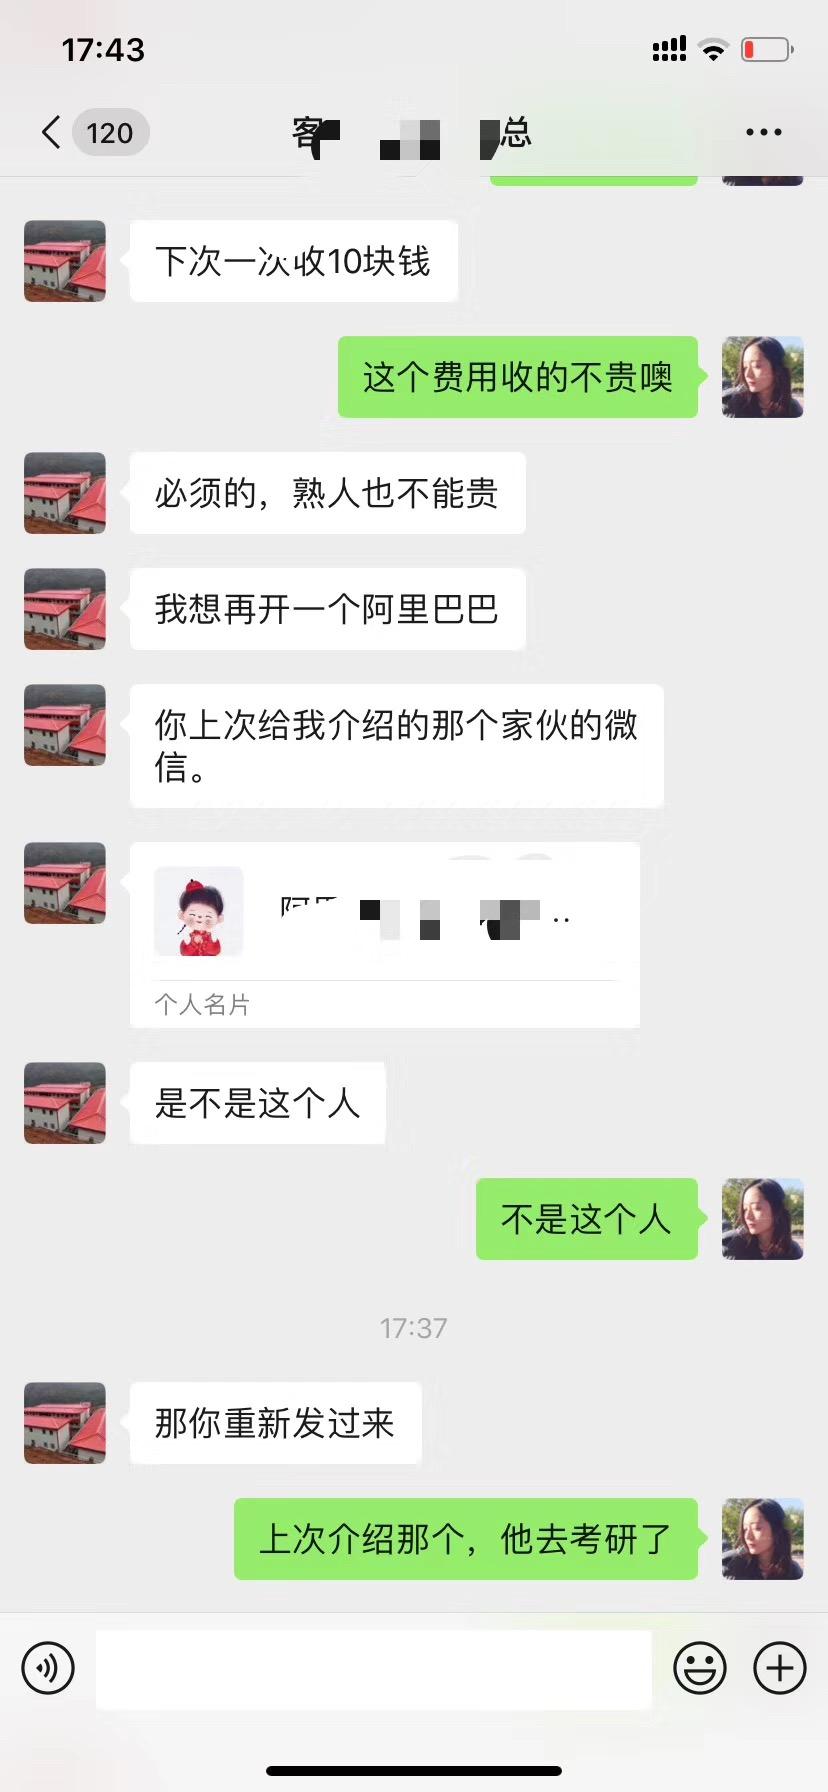 bob亚洲官网网络公司